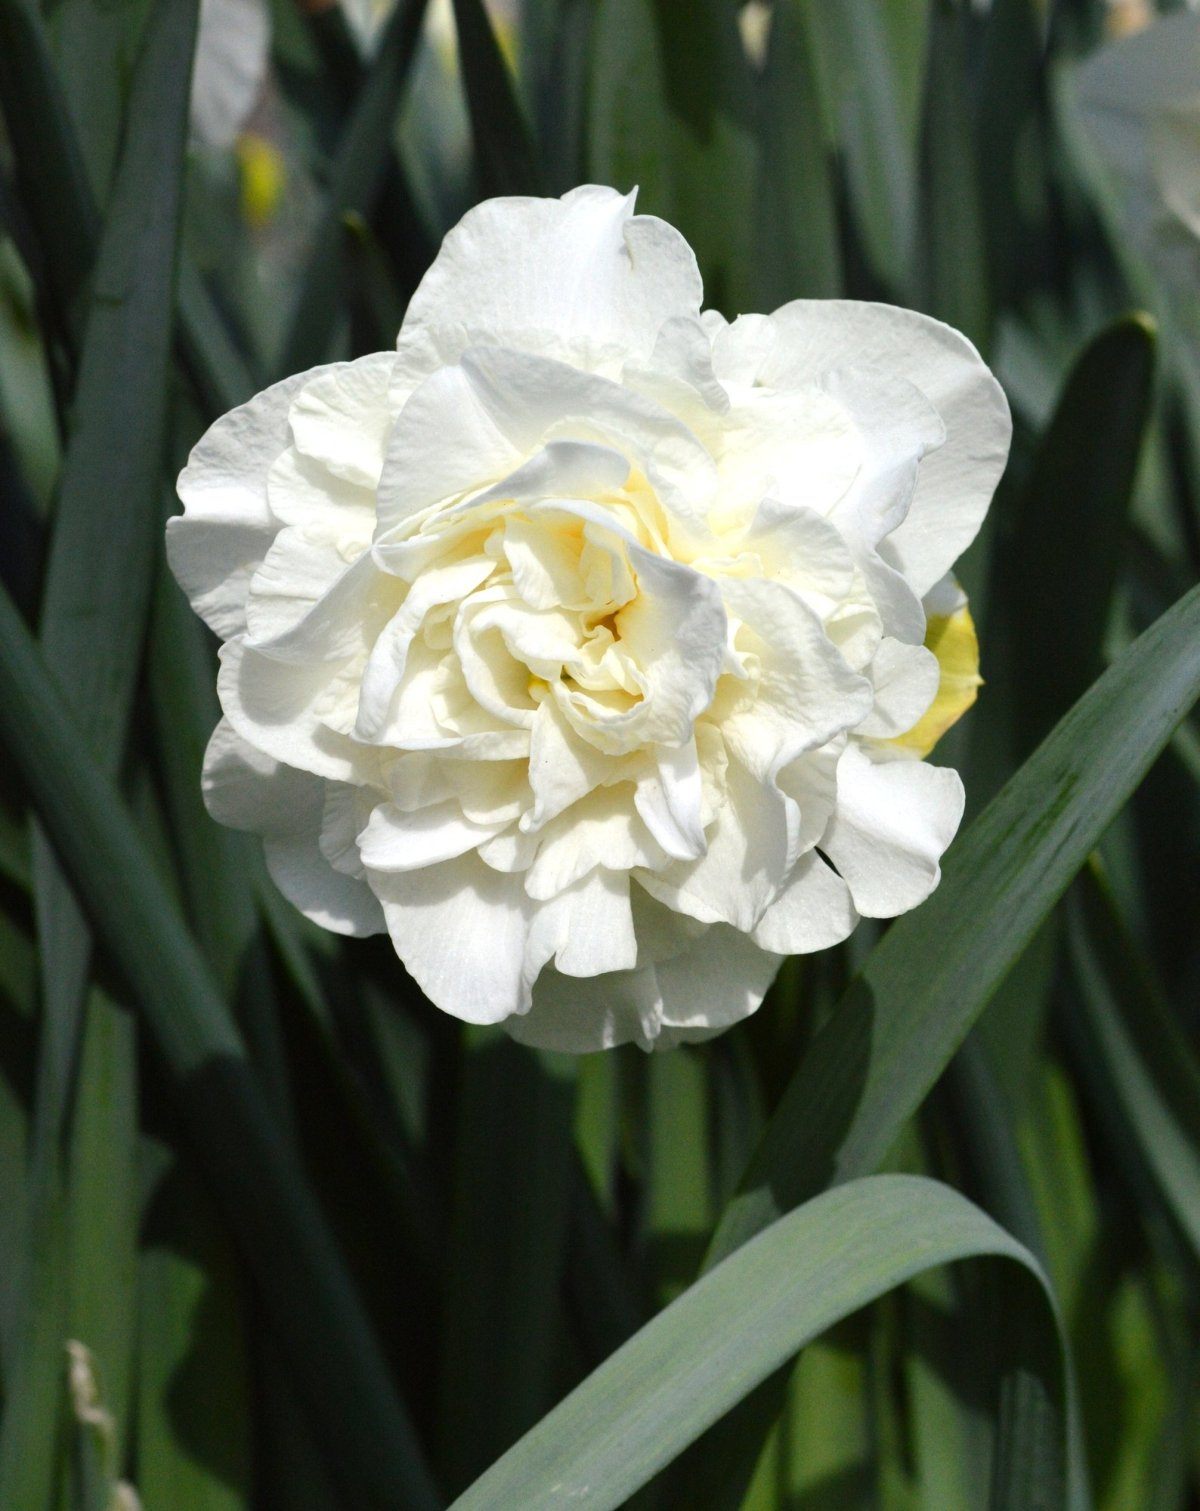 Narcissus-White-Explosion-1